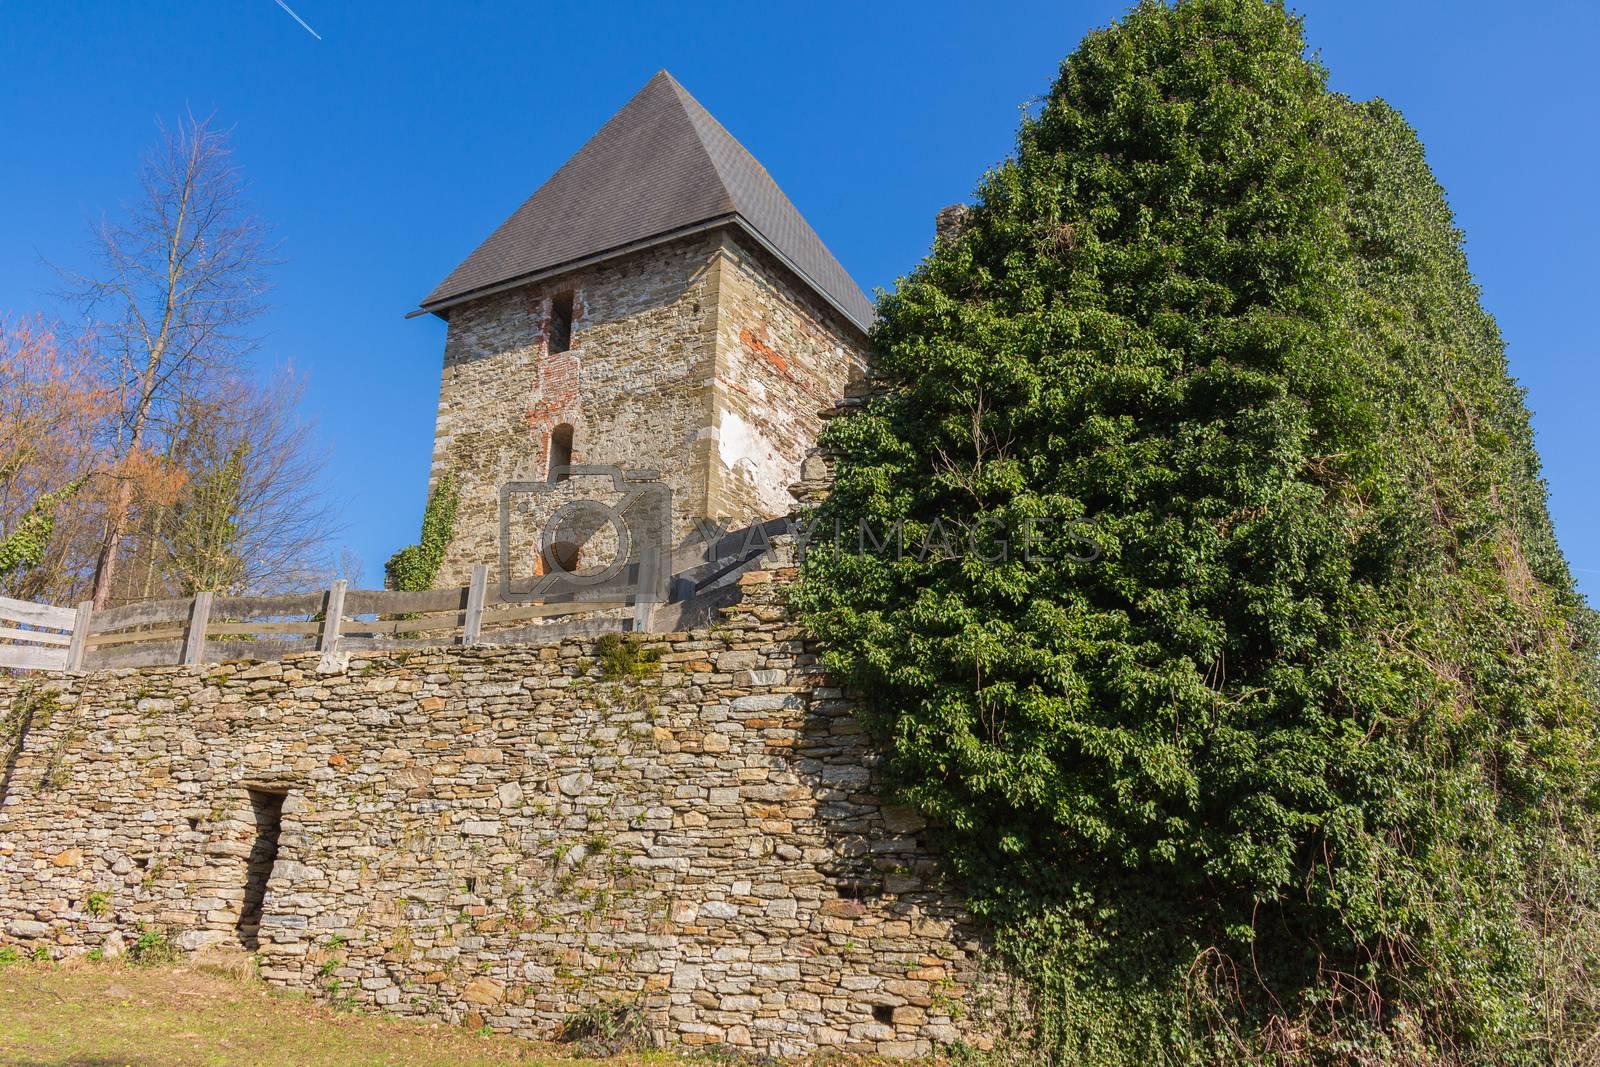 Medieval castle in Styria,Austria